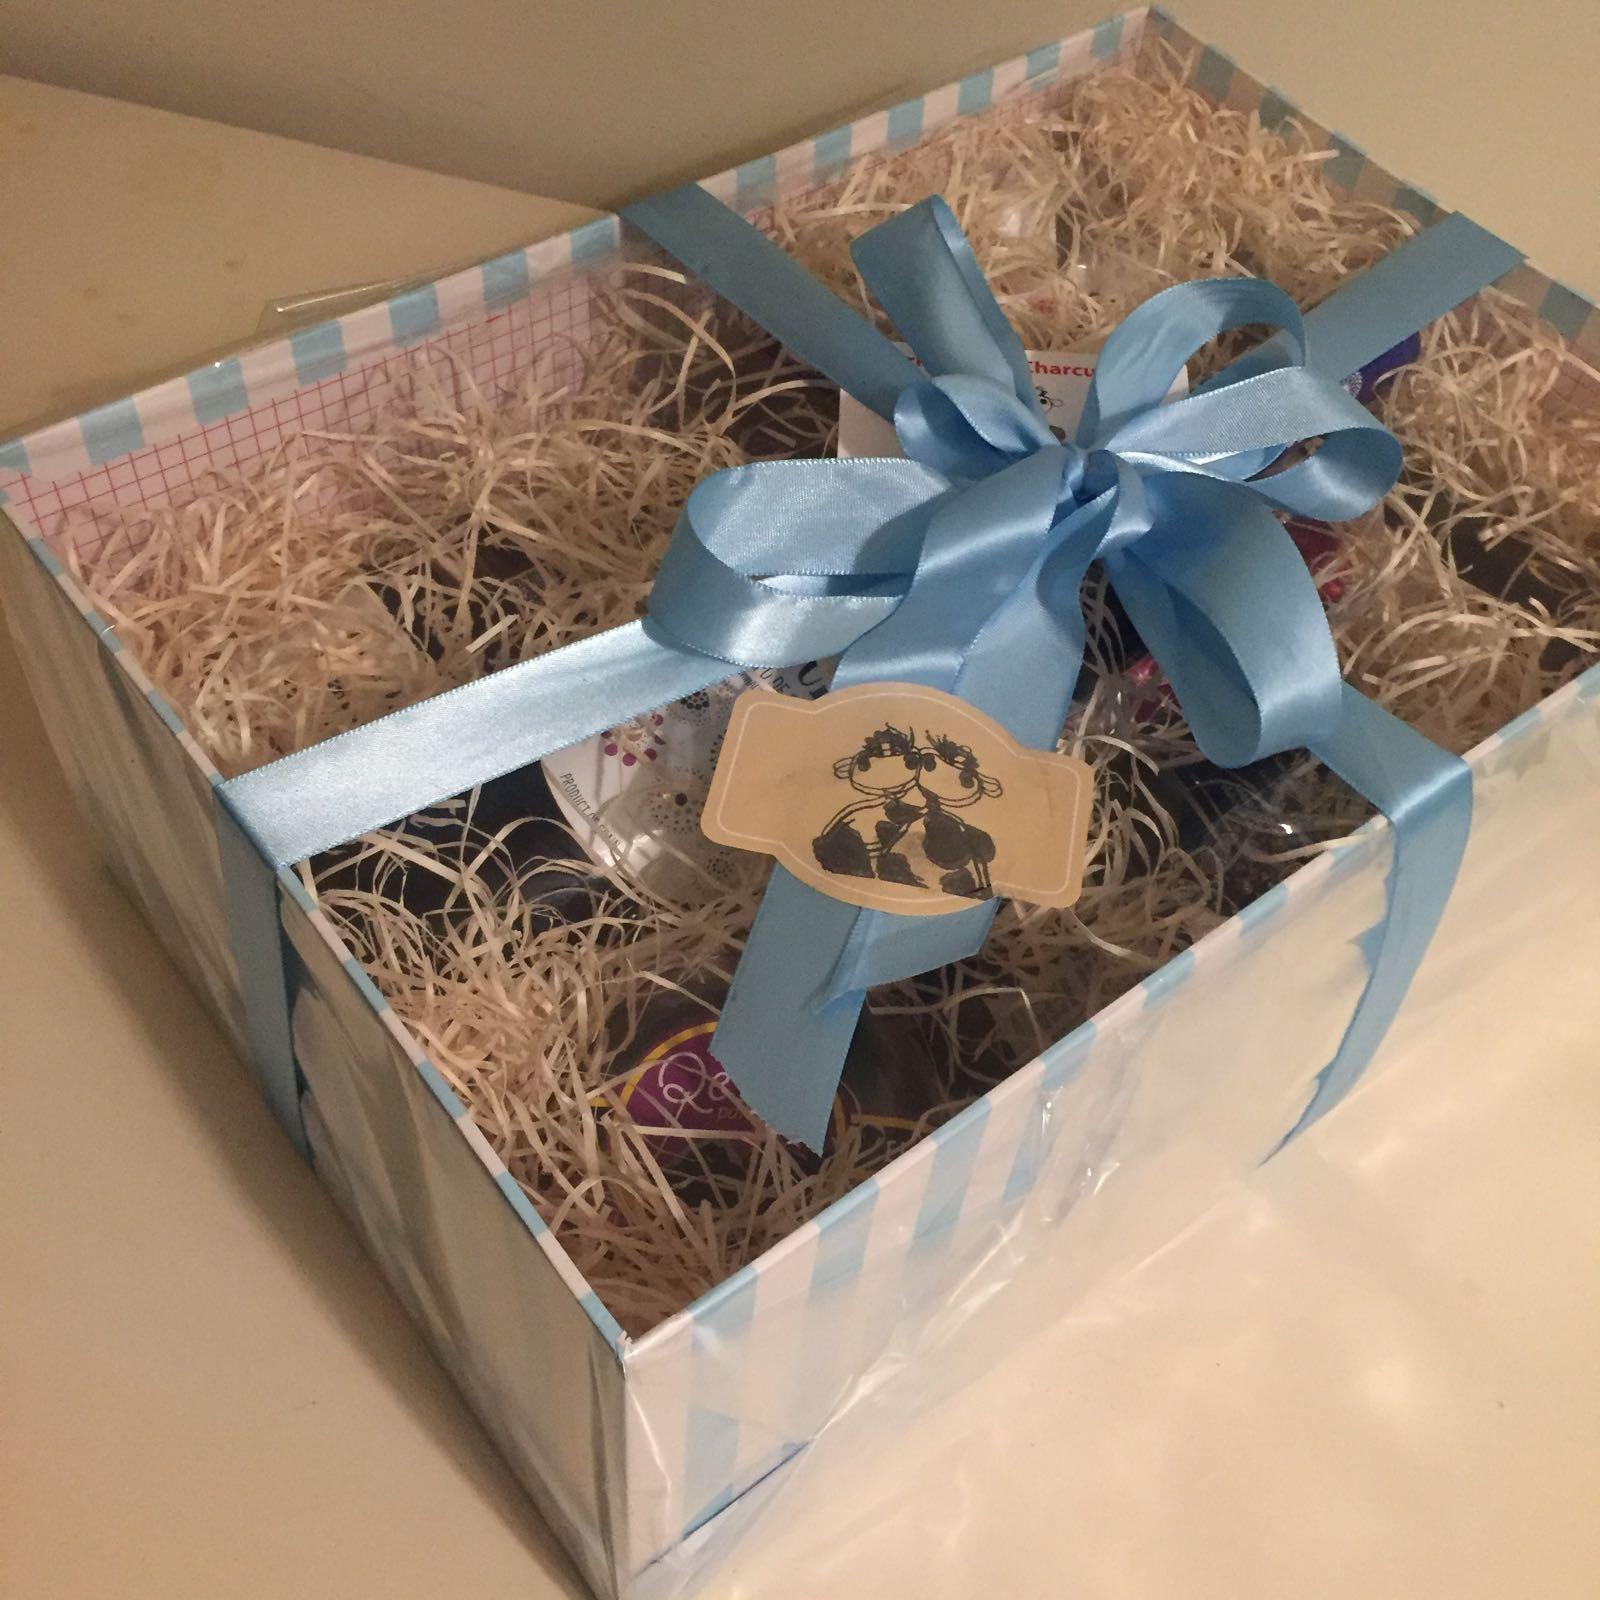 Pedidos de regalo en Zaragoza